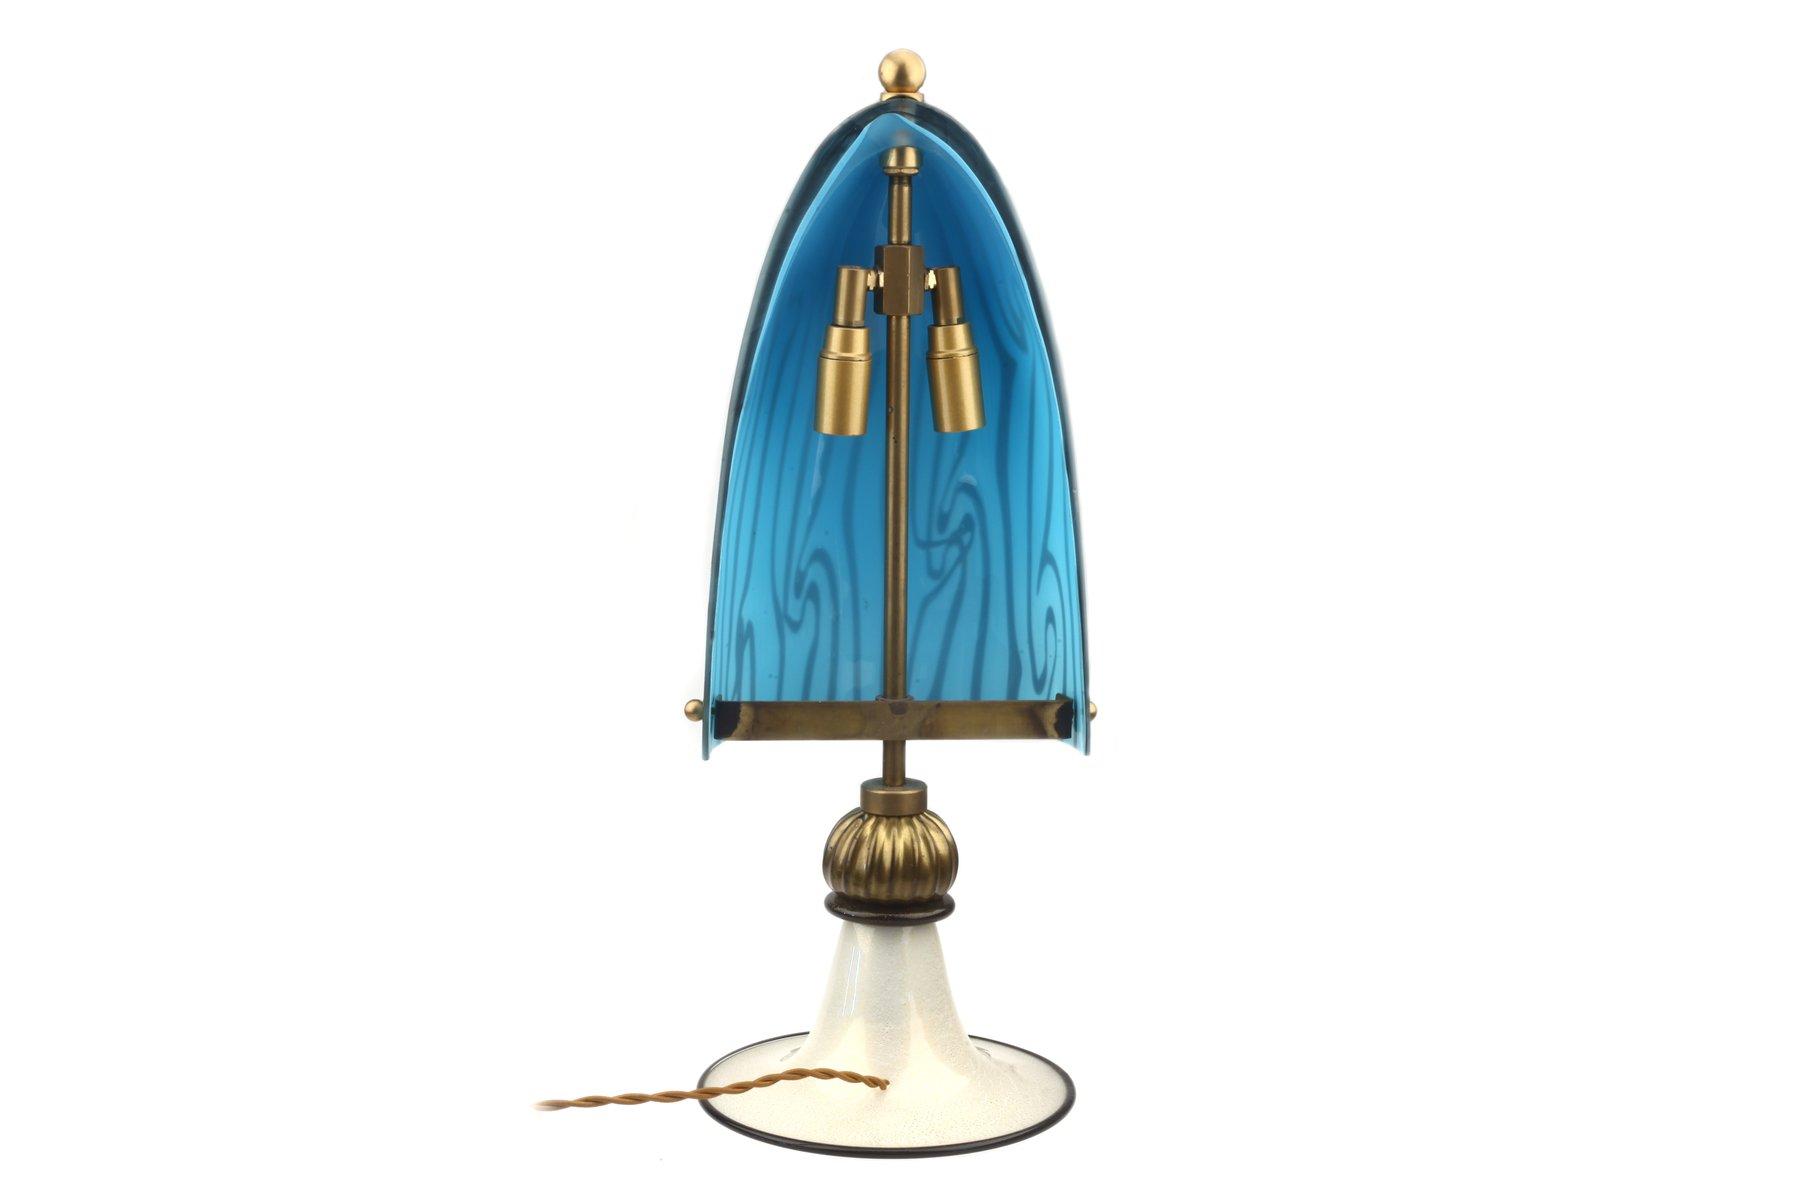 lampe de table en verre murano avec feuille dor e en vente sur pamono. Black Bedroom Furniture Sets. Home Design Ideas